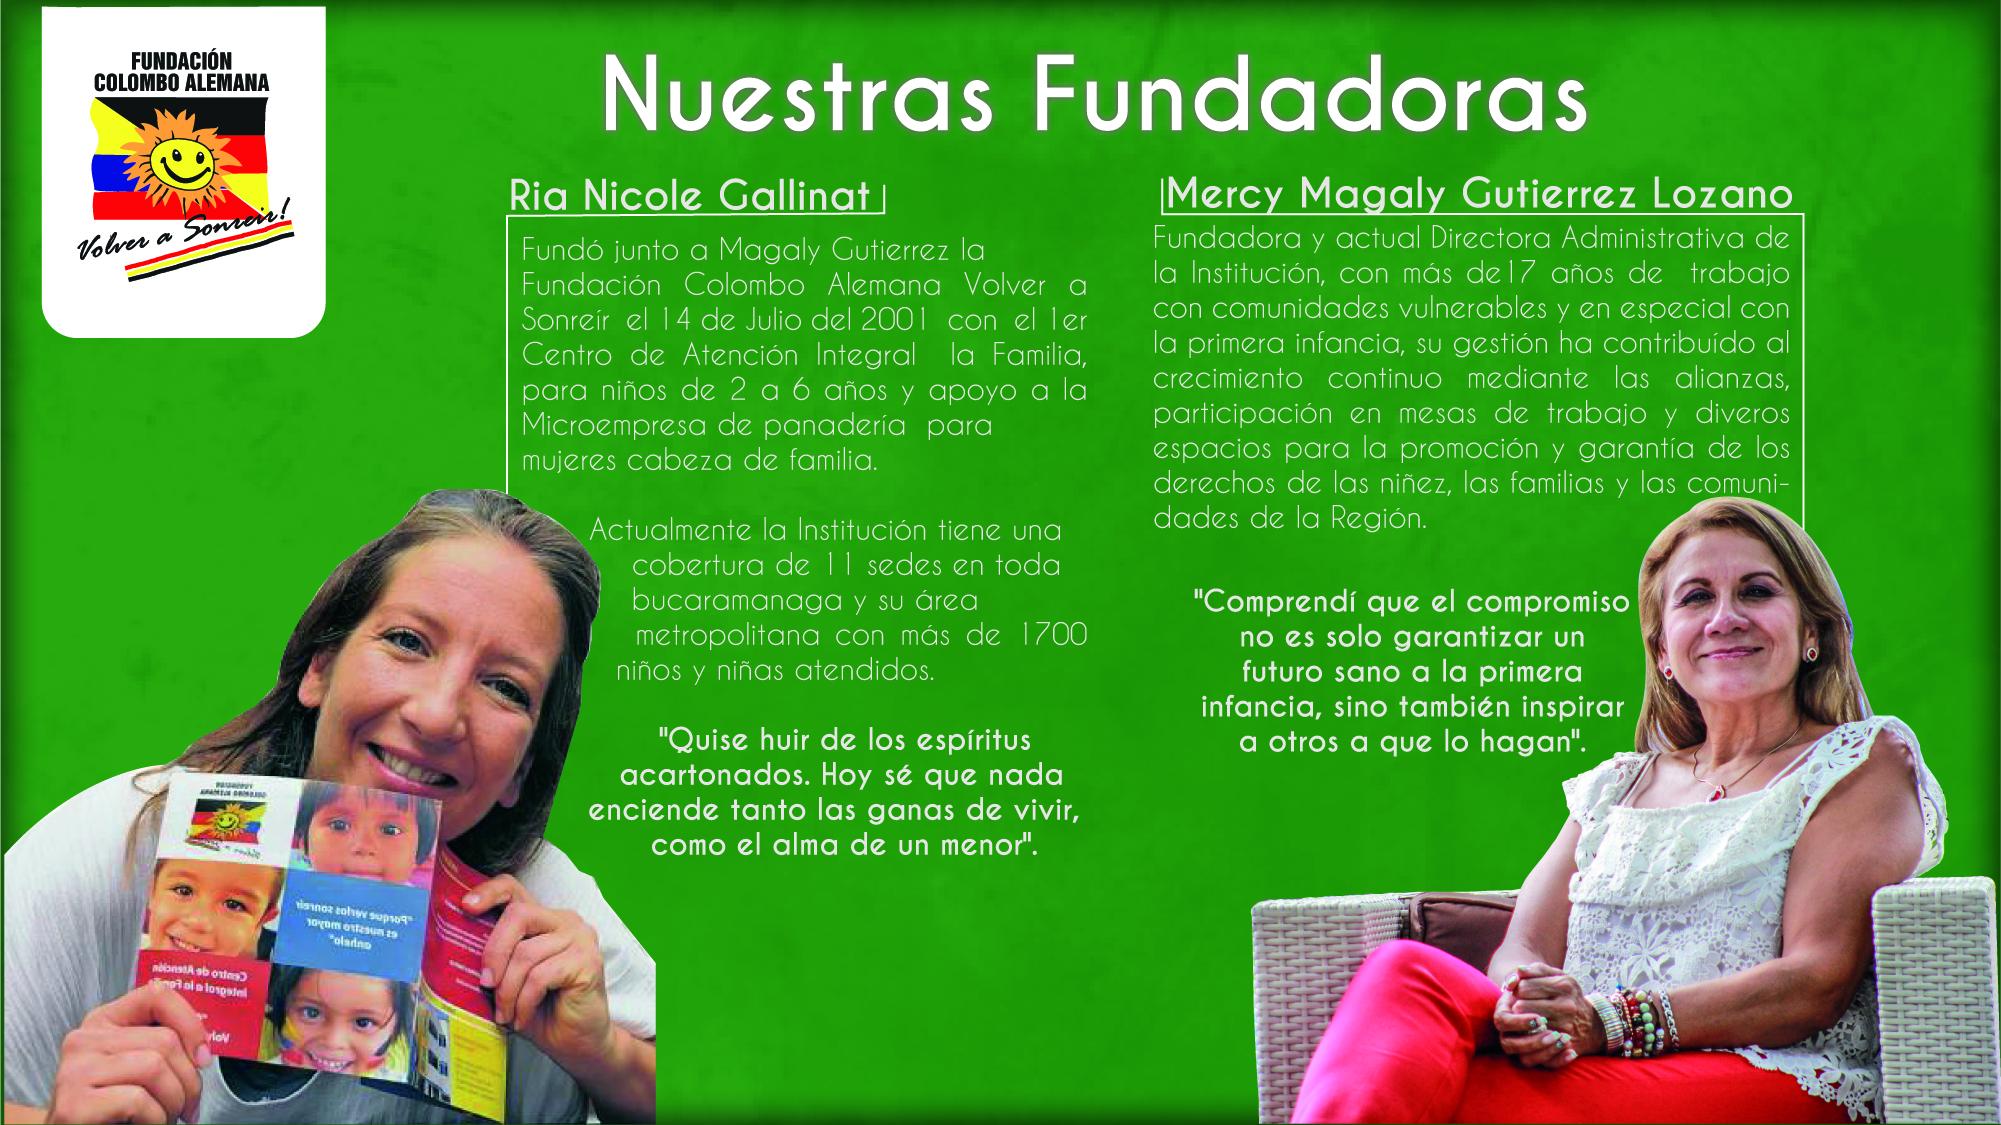 FUNDADORAS FUNDACIÓN COLOMBO ALEMANA